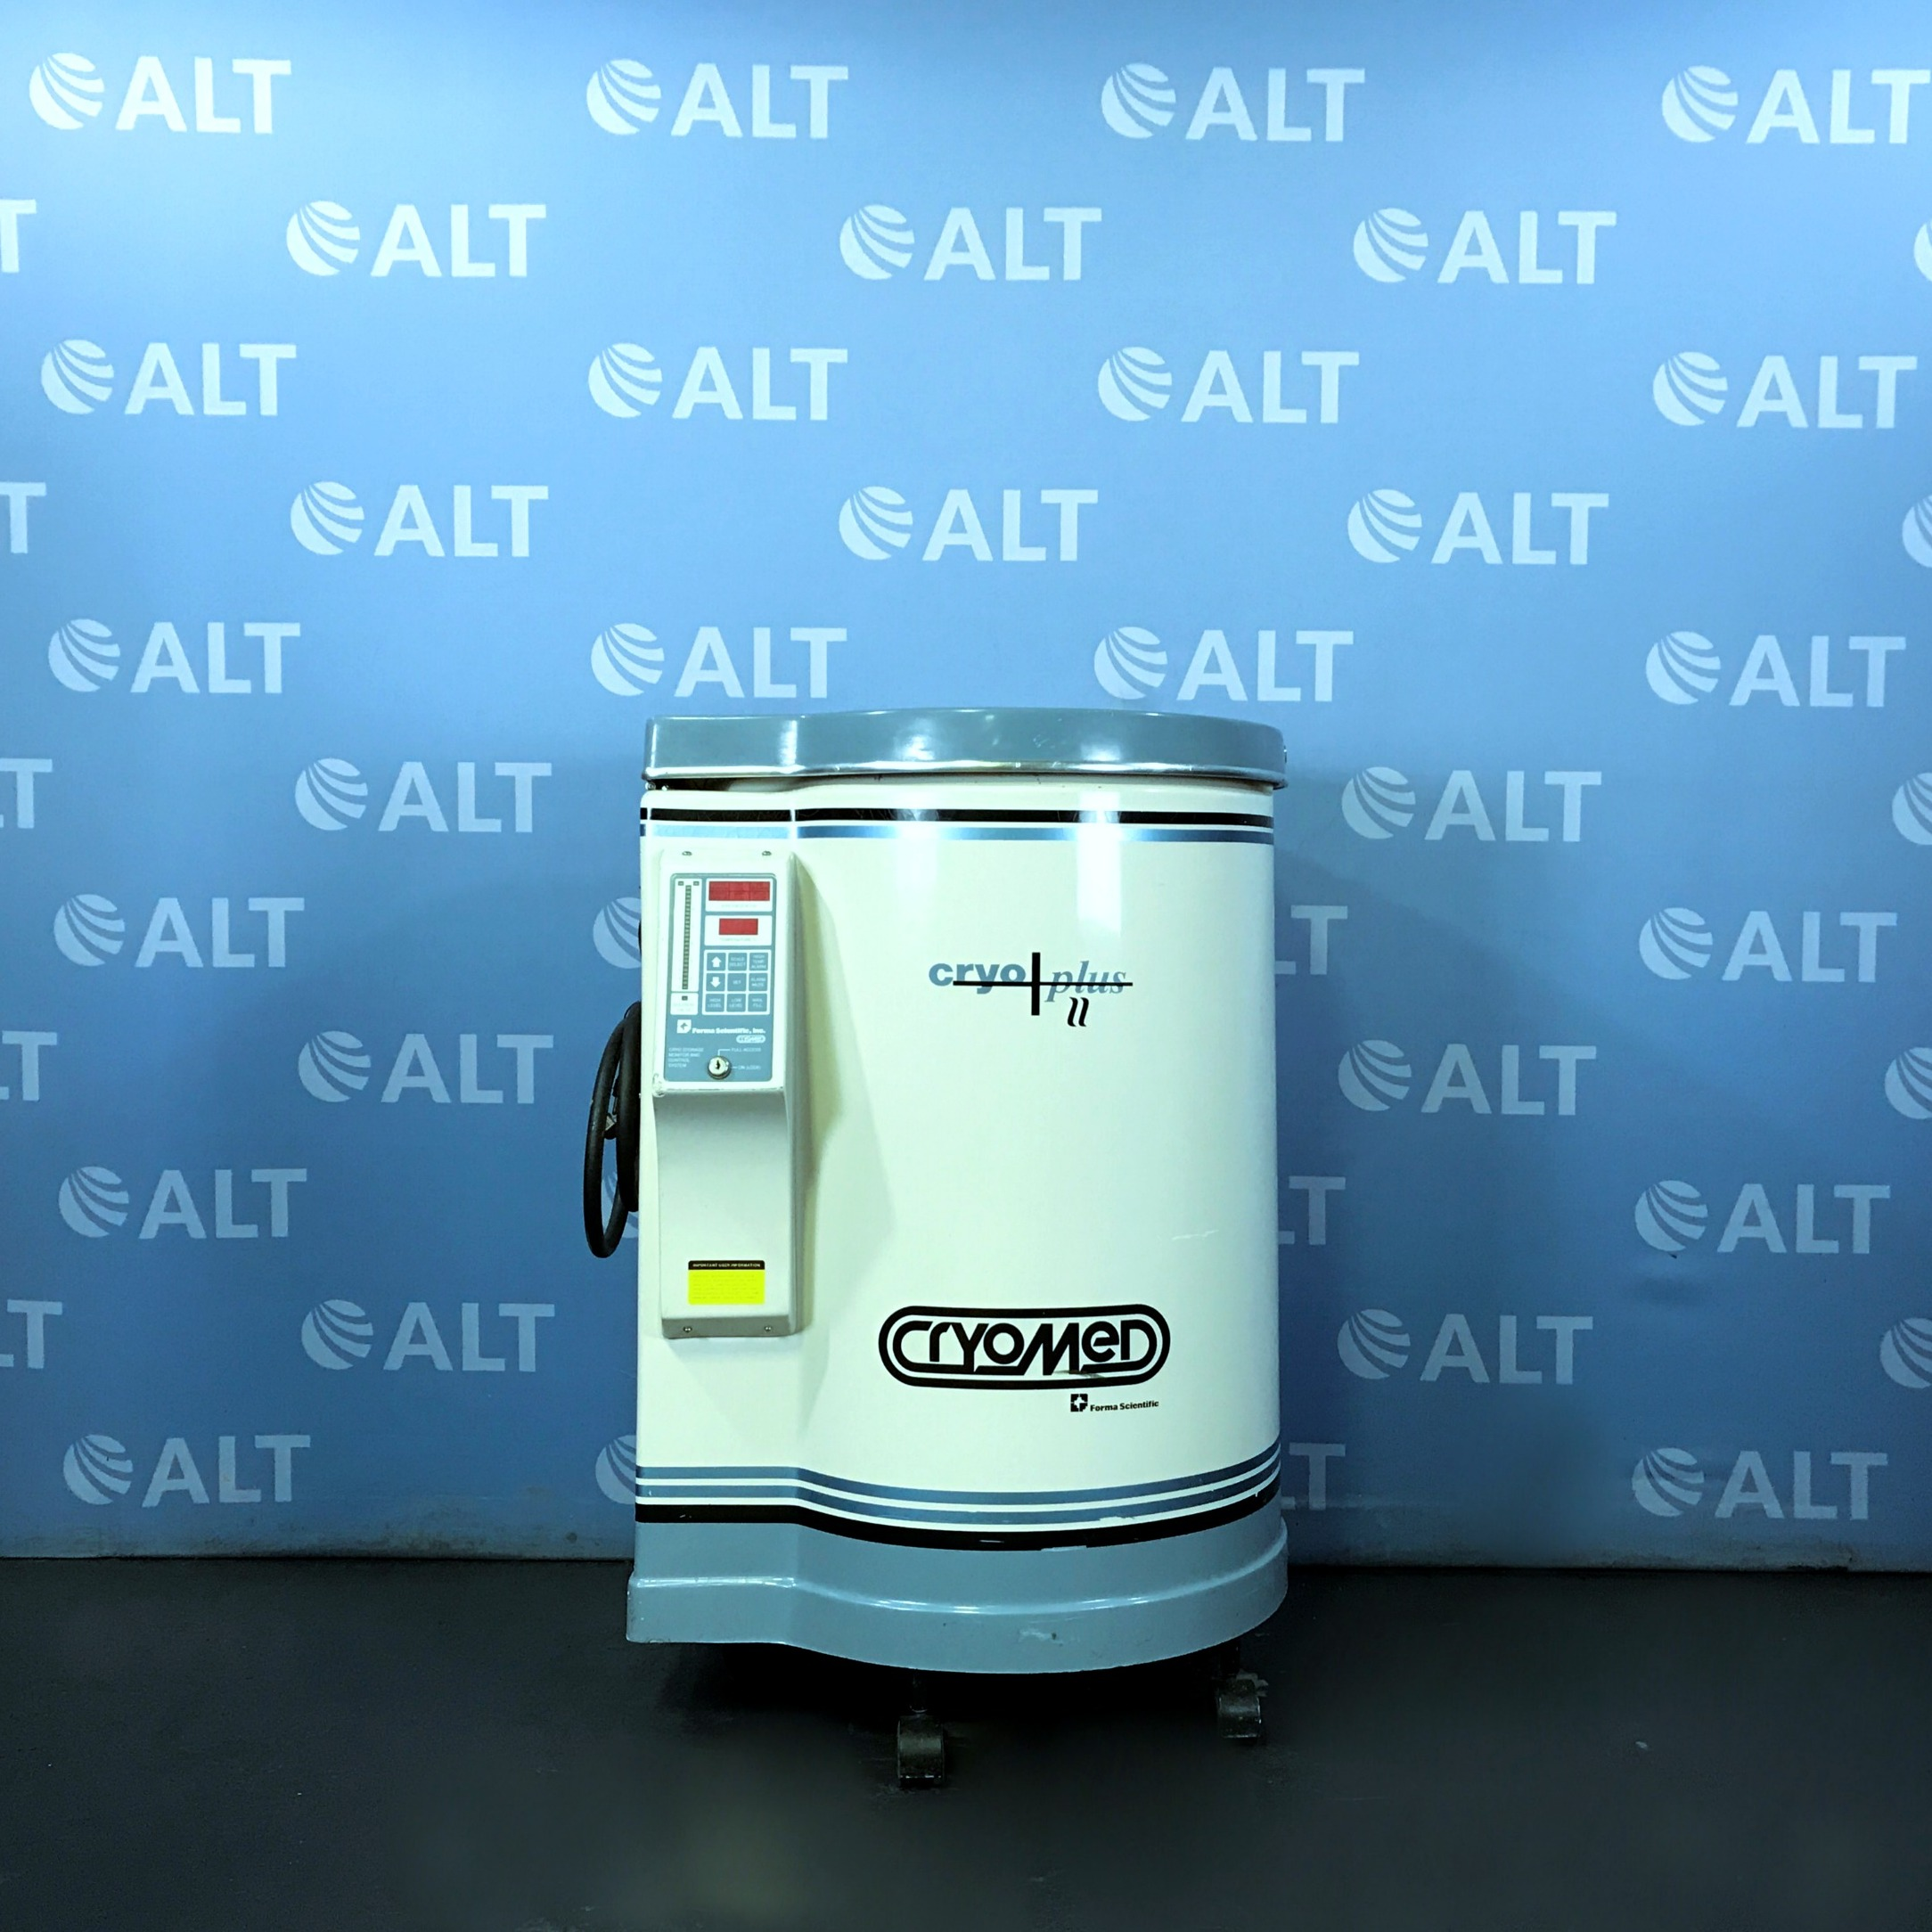 Forma Scientific Cryomed / Cryoplus II Liquid Nitrogen Storage Vessel Model 8175 Image